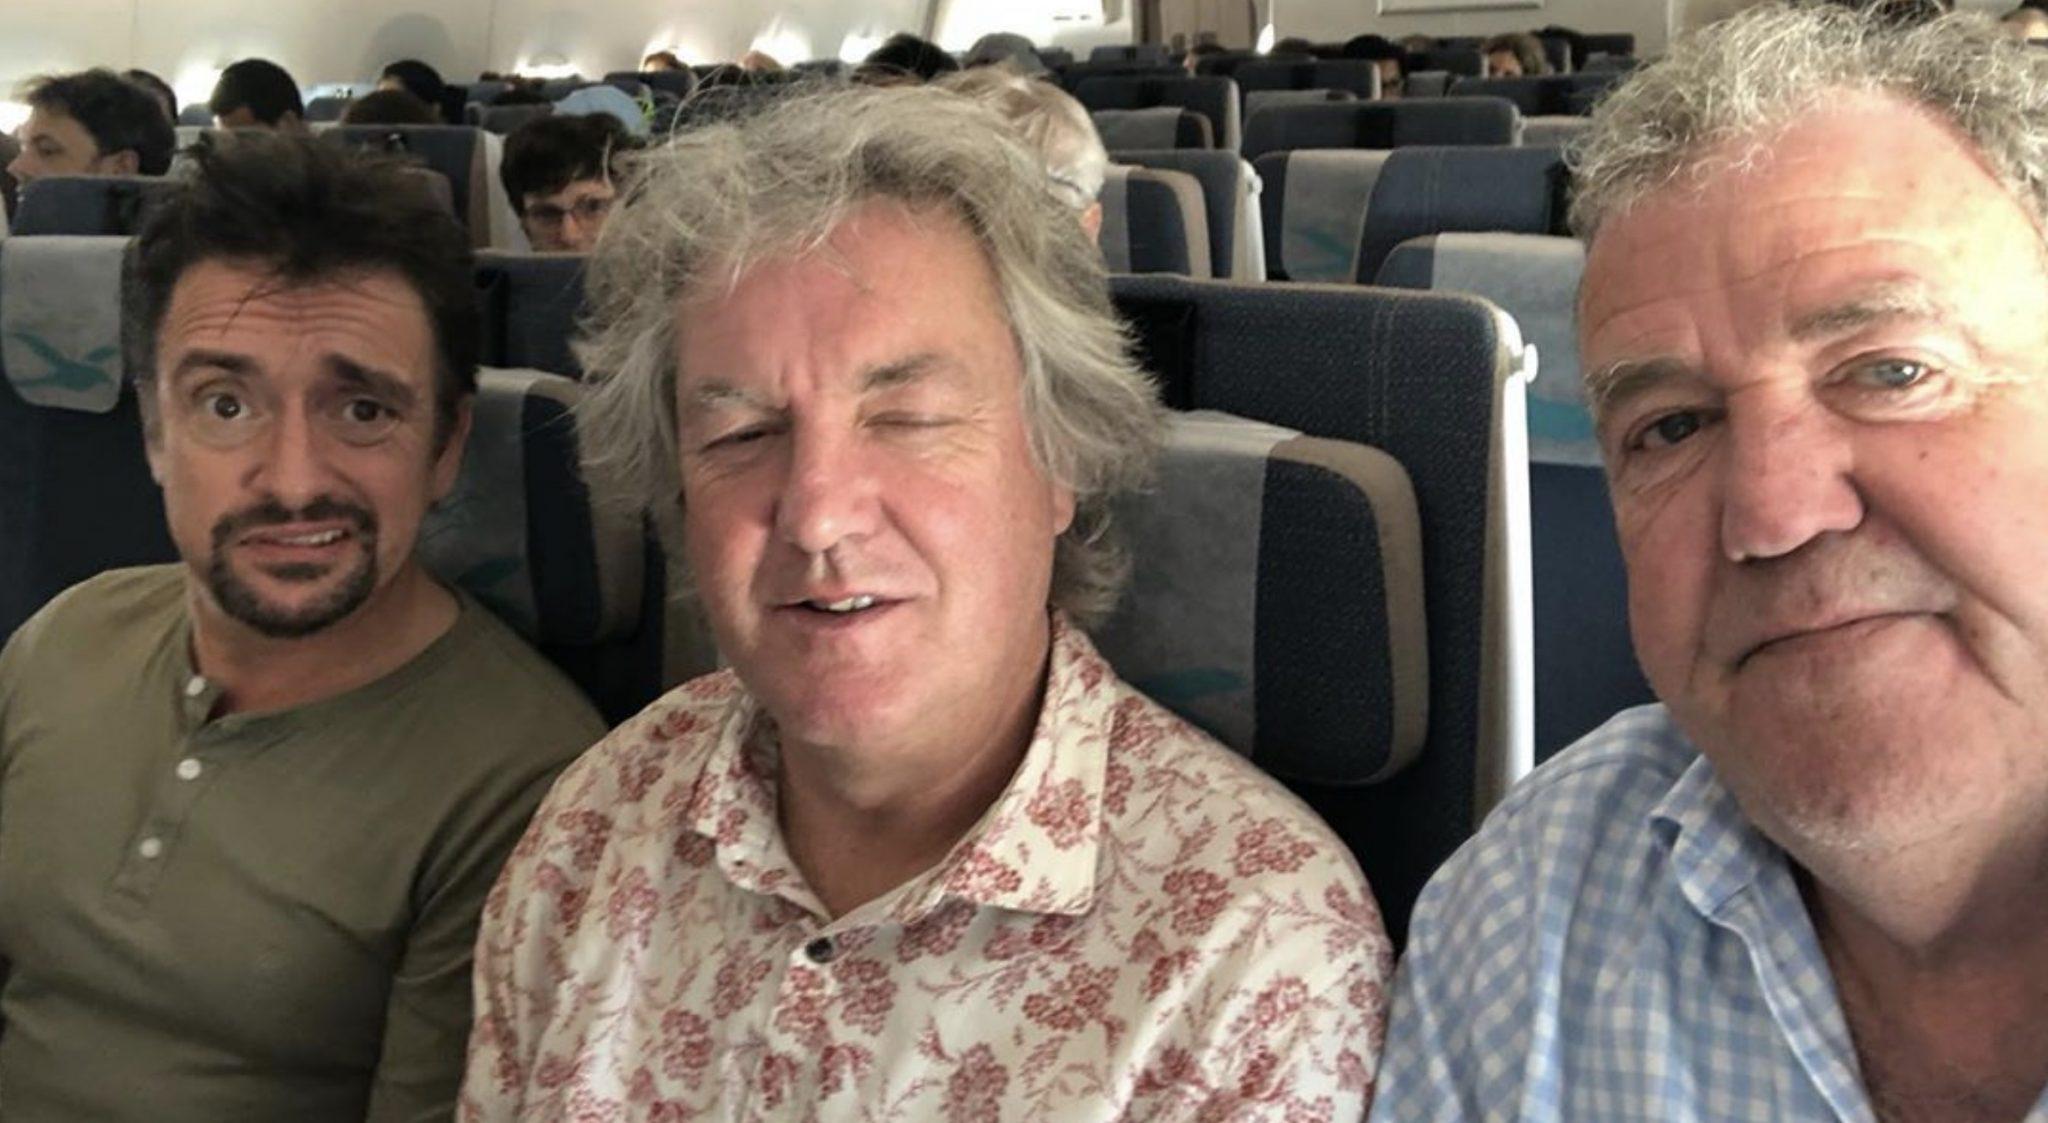 Richard Hammond, James May, Jeremy Clarkson, The Grand Tour, Amazon-https://www.instagram.com/p/B4broiLgbyb/